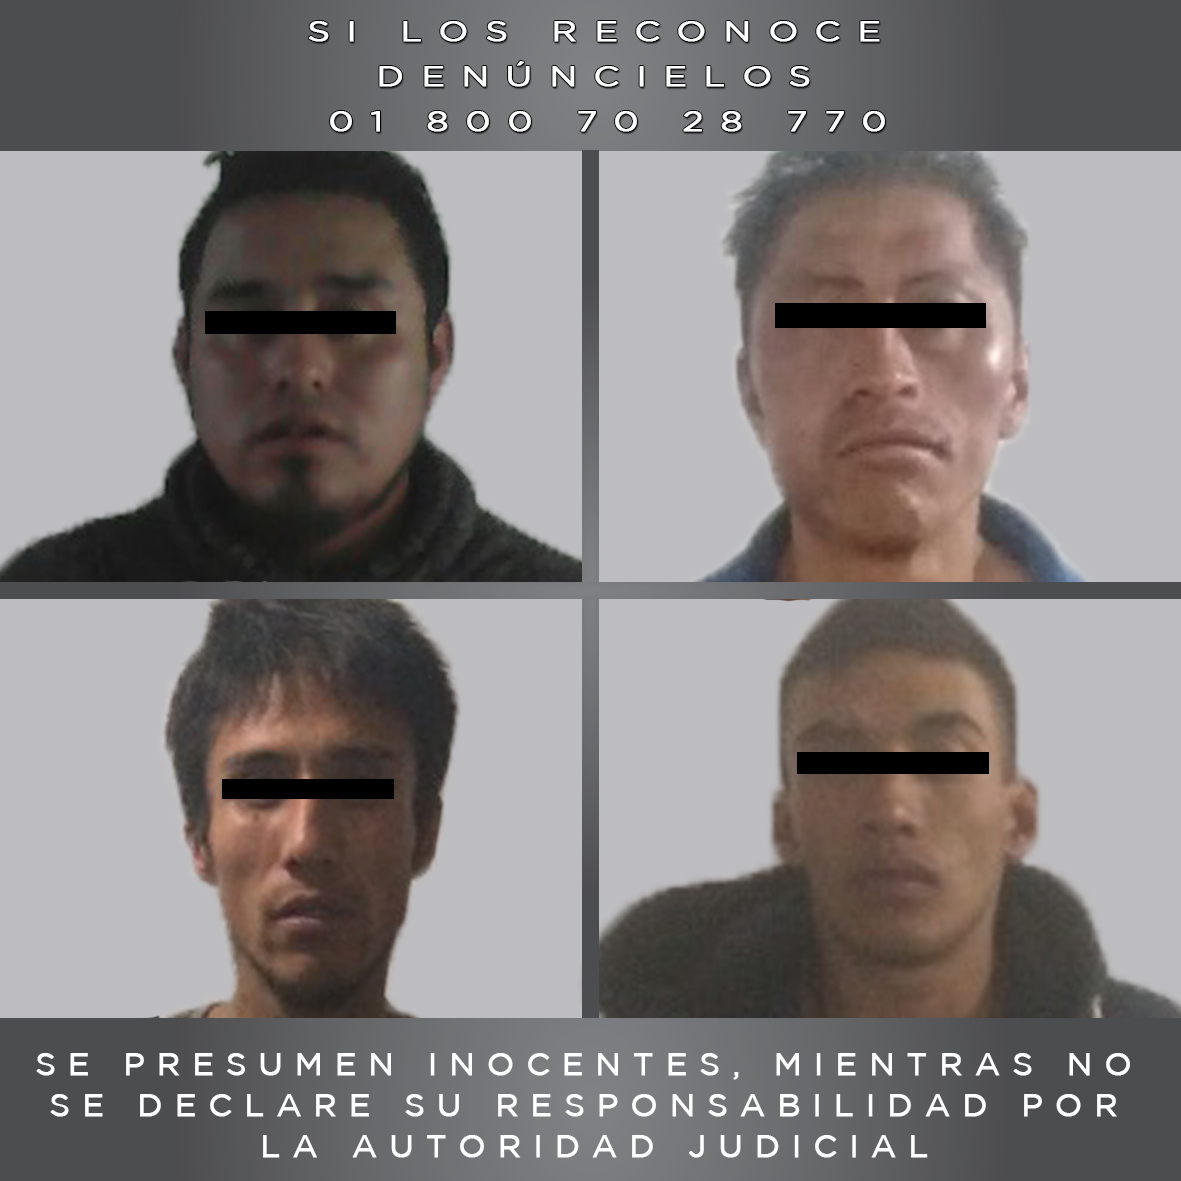 Procesan penalmente a cuatro detenidos en Valle de Toluca